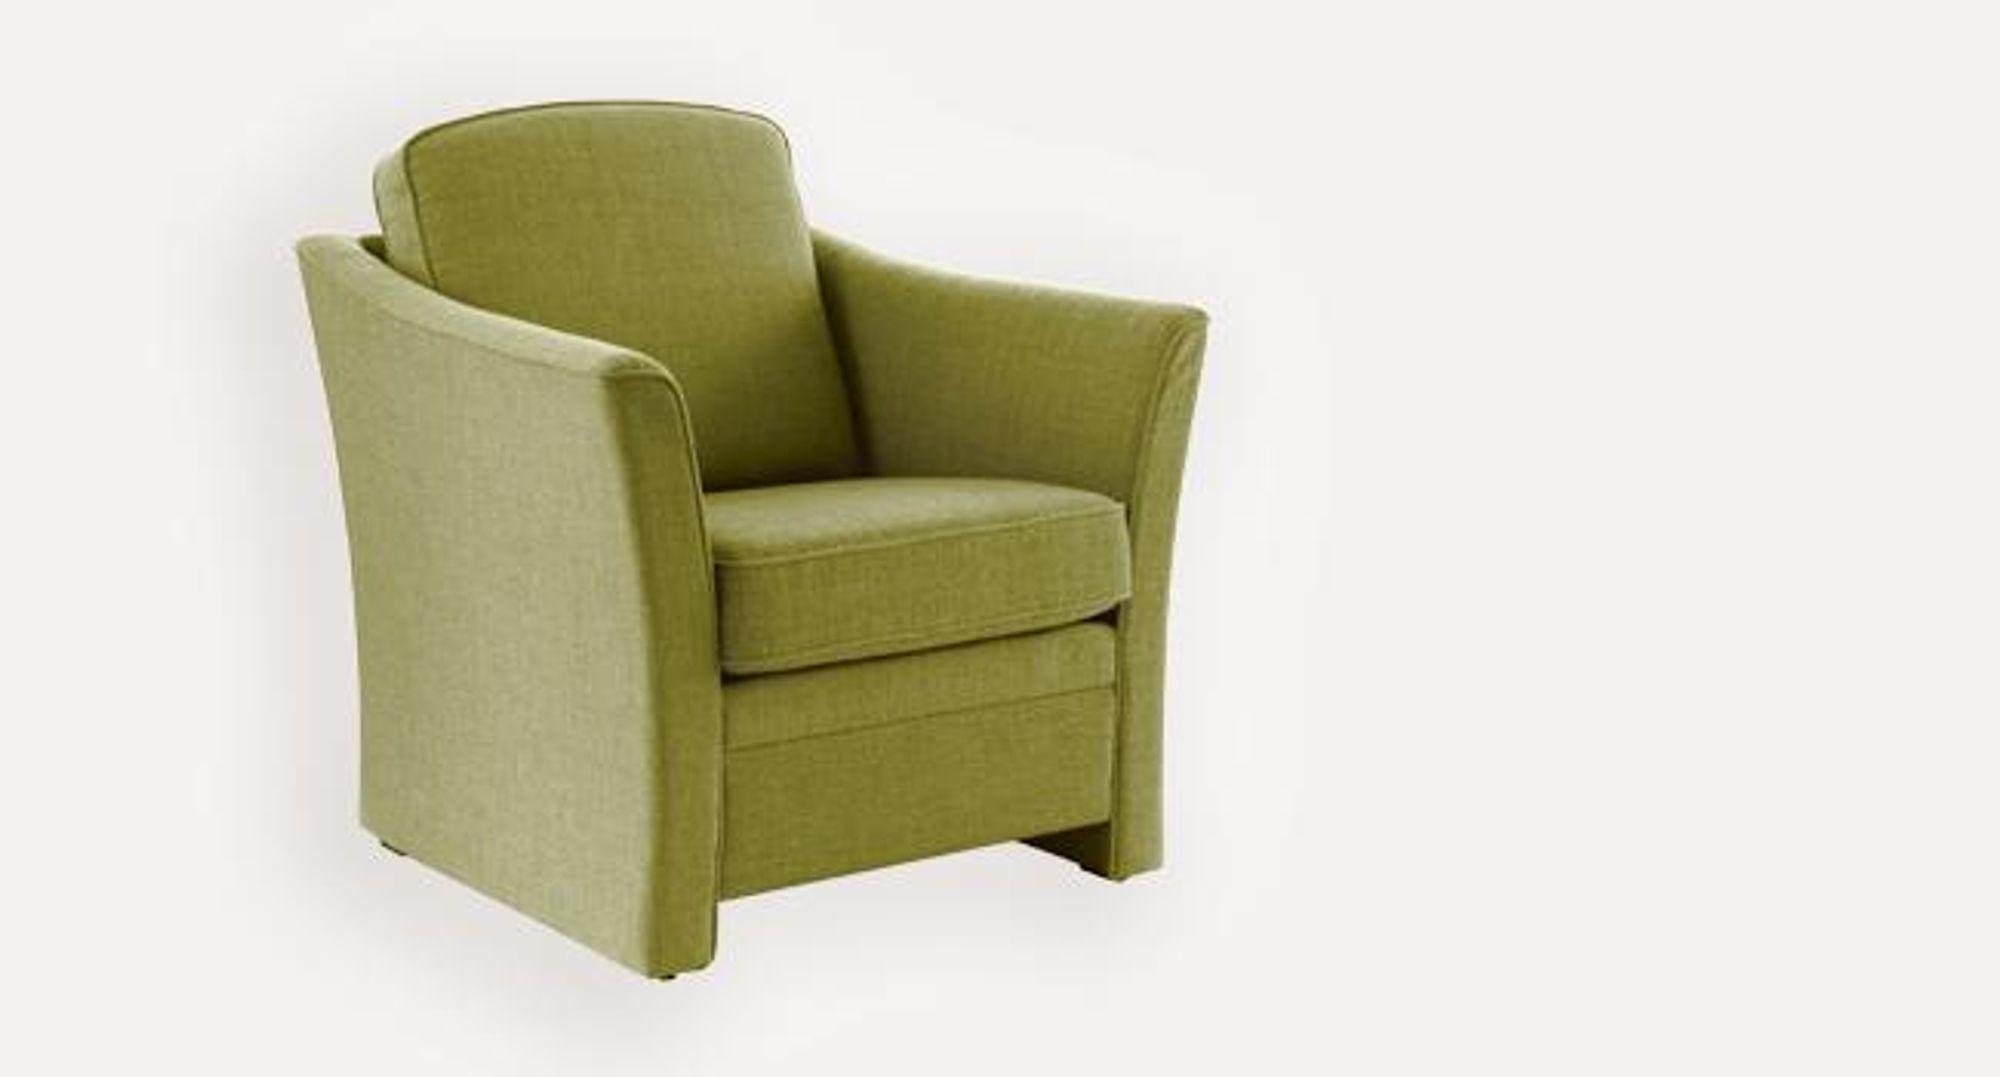 NORSKE MØBLER: Hjellegjerde selger møbler til en rekke land over hele verden.